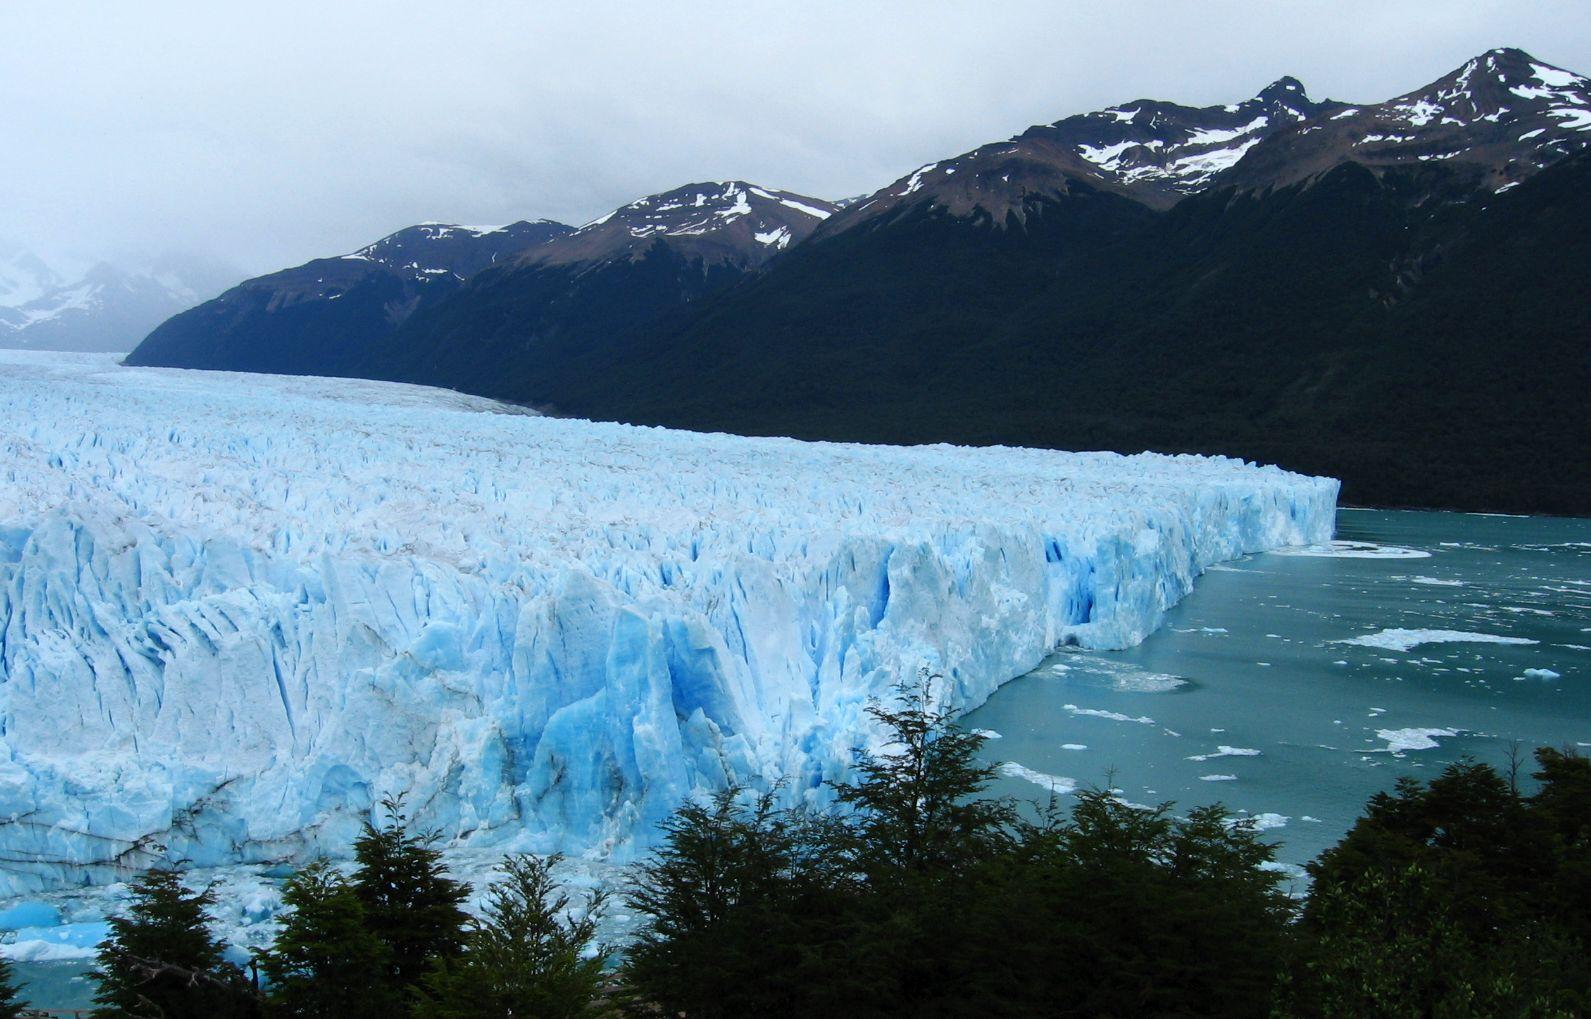 Argentína, Perito Moreno gleccser - Fotó: Papp Éva